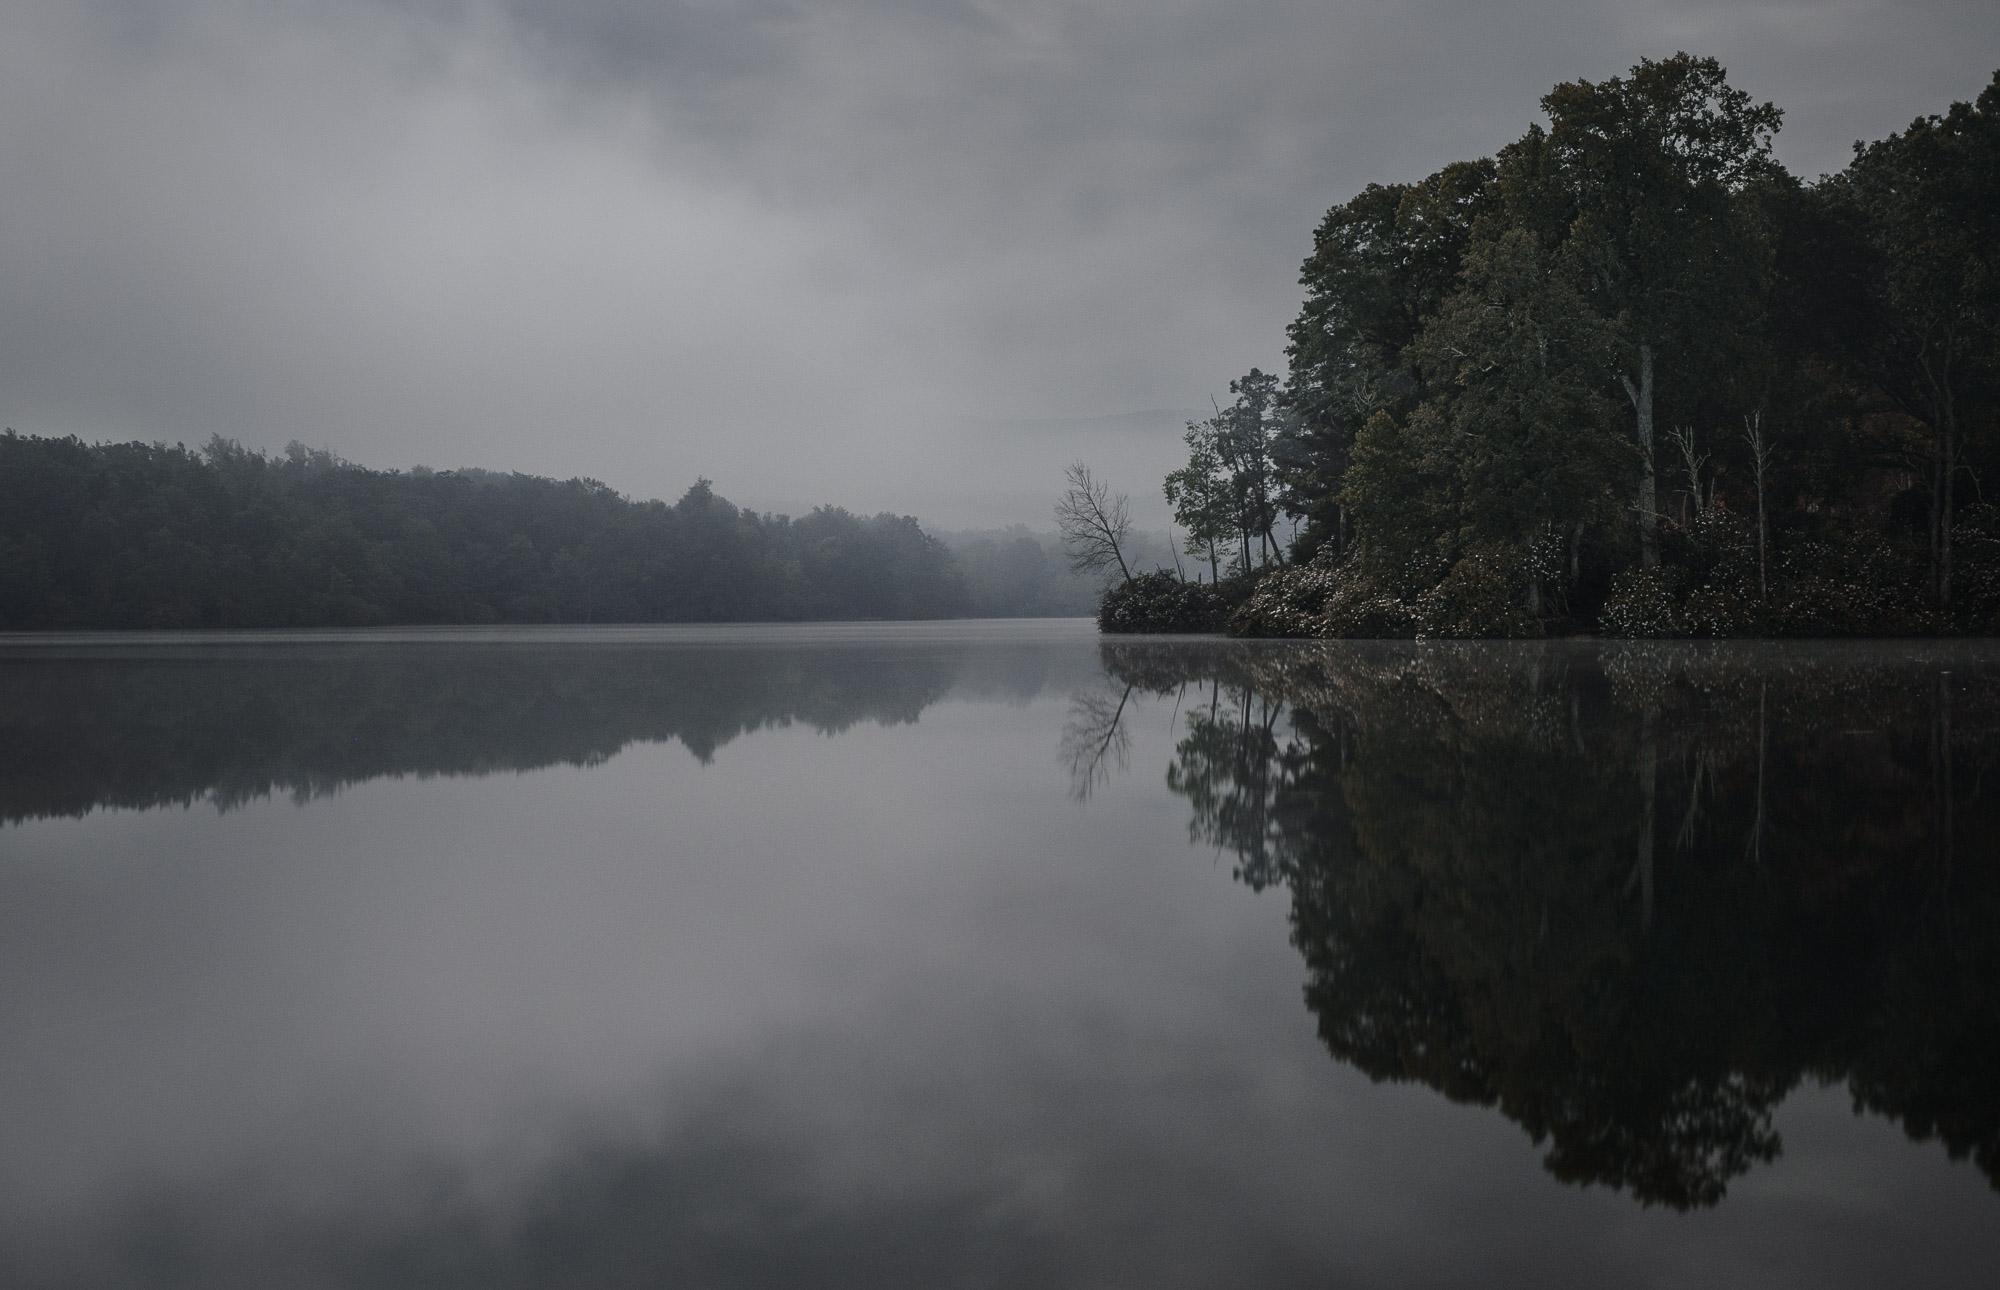 Blue Ridge Parkway_Nicholson__LH22313.jpg